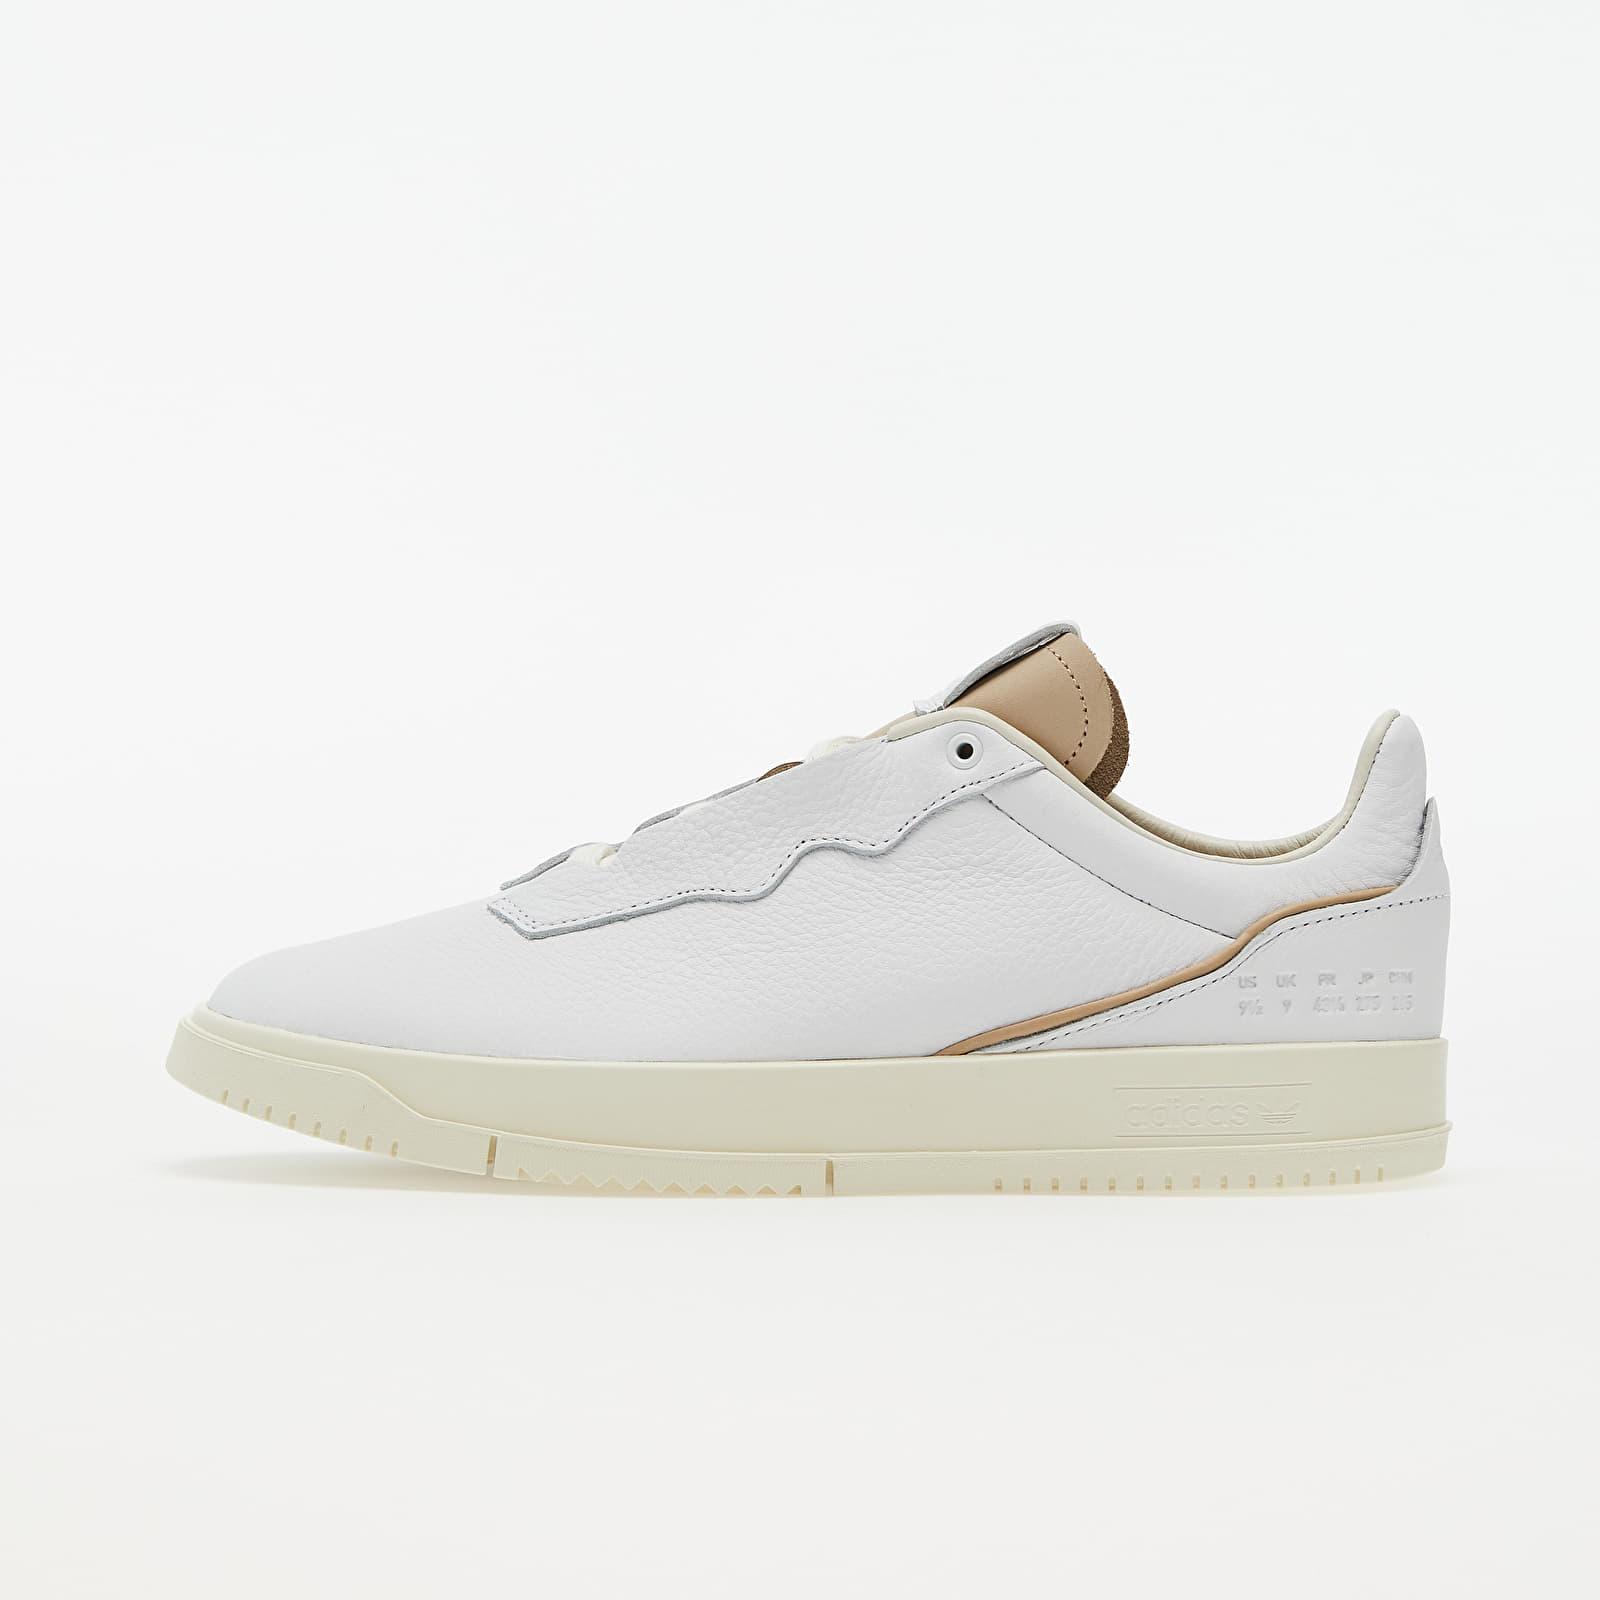 adidas Supercourt Premium Ftw White/ Ftw White/ Off White FY5472